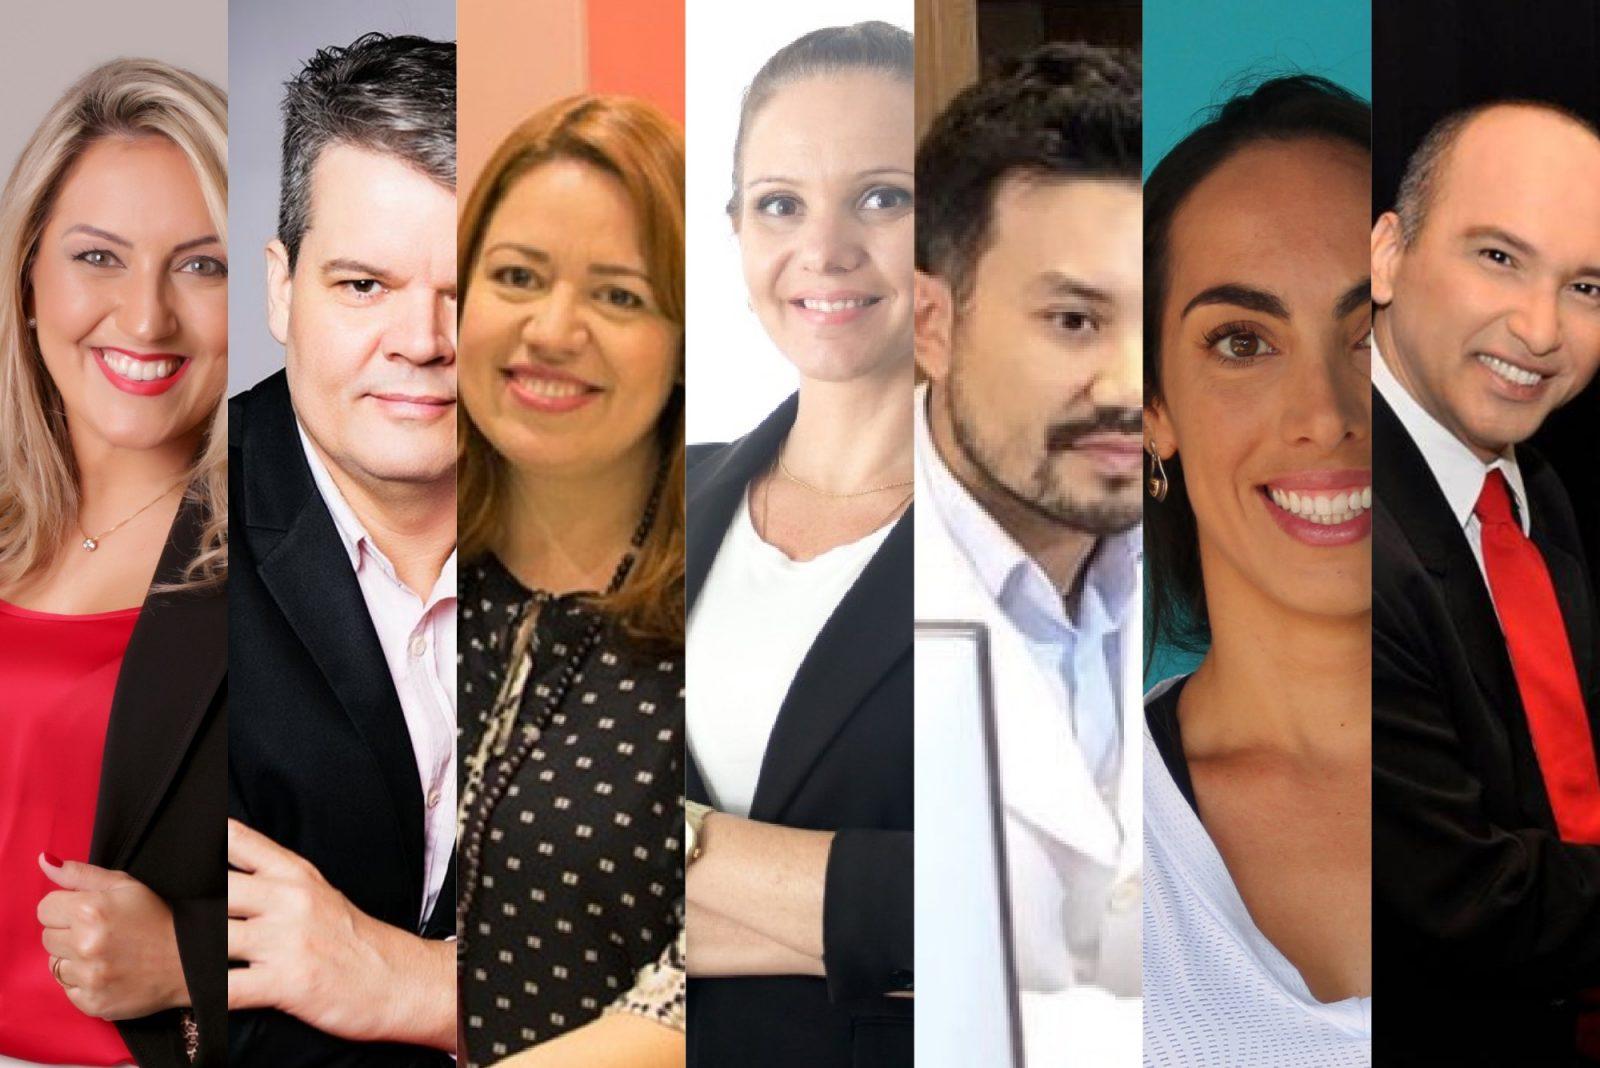 7 especialistas juntos, um único objetivo: Líder Pleno